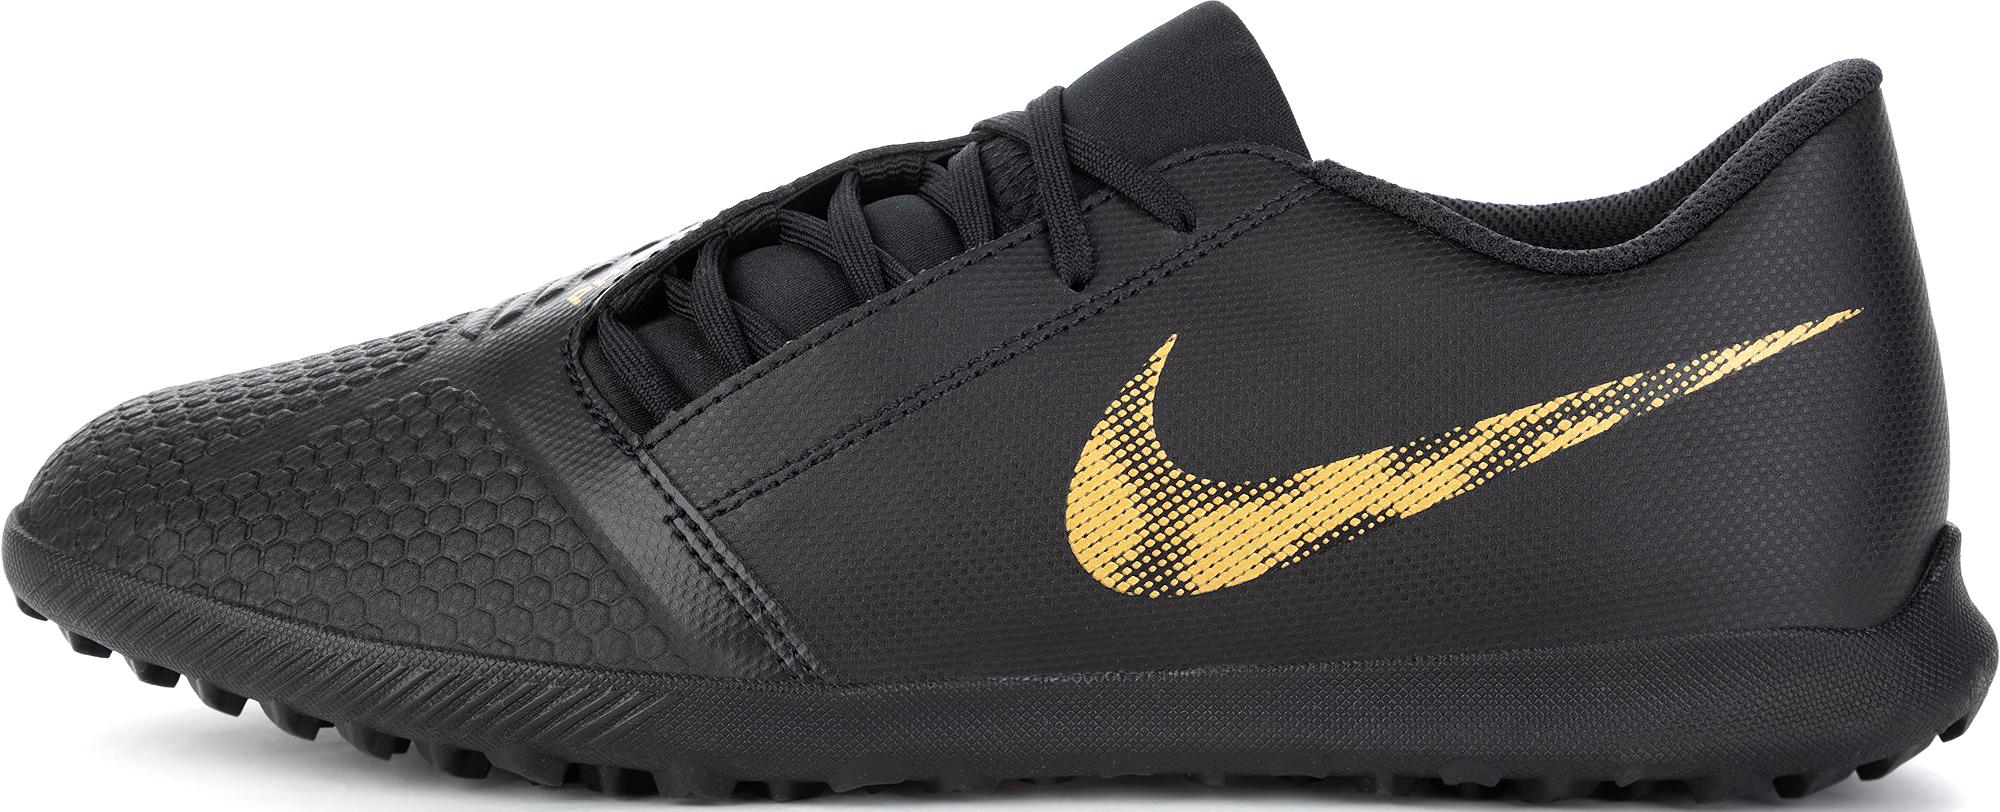 Nike Бутсы мужские Nike Phantom Venom Club TF, размер 45 цена